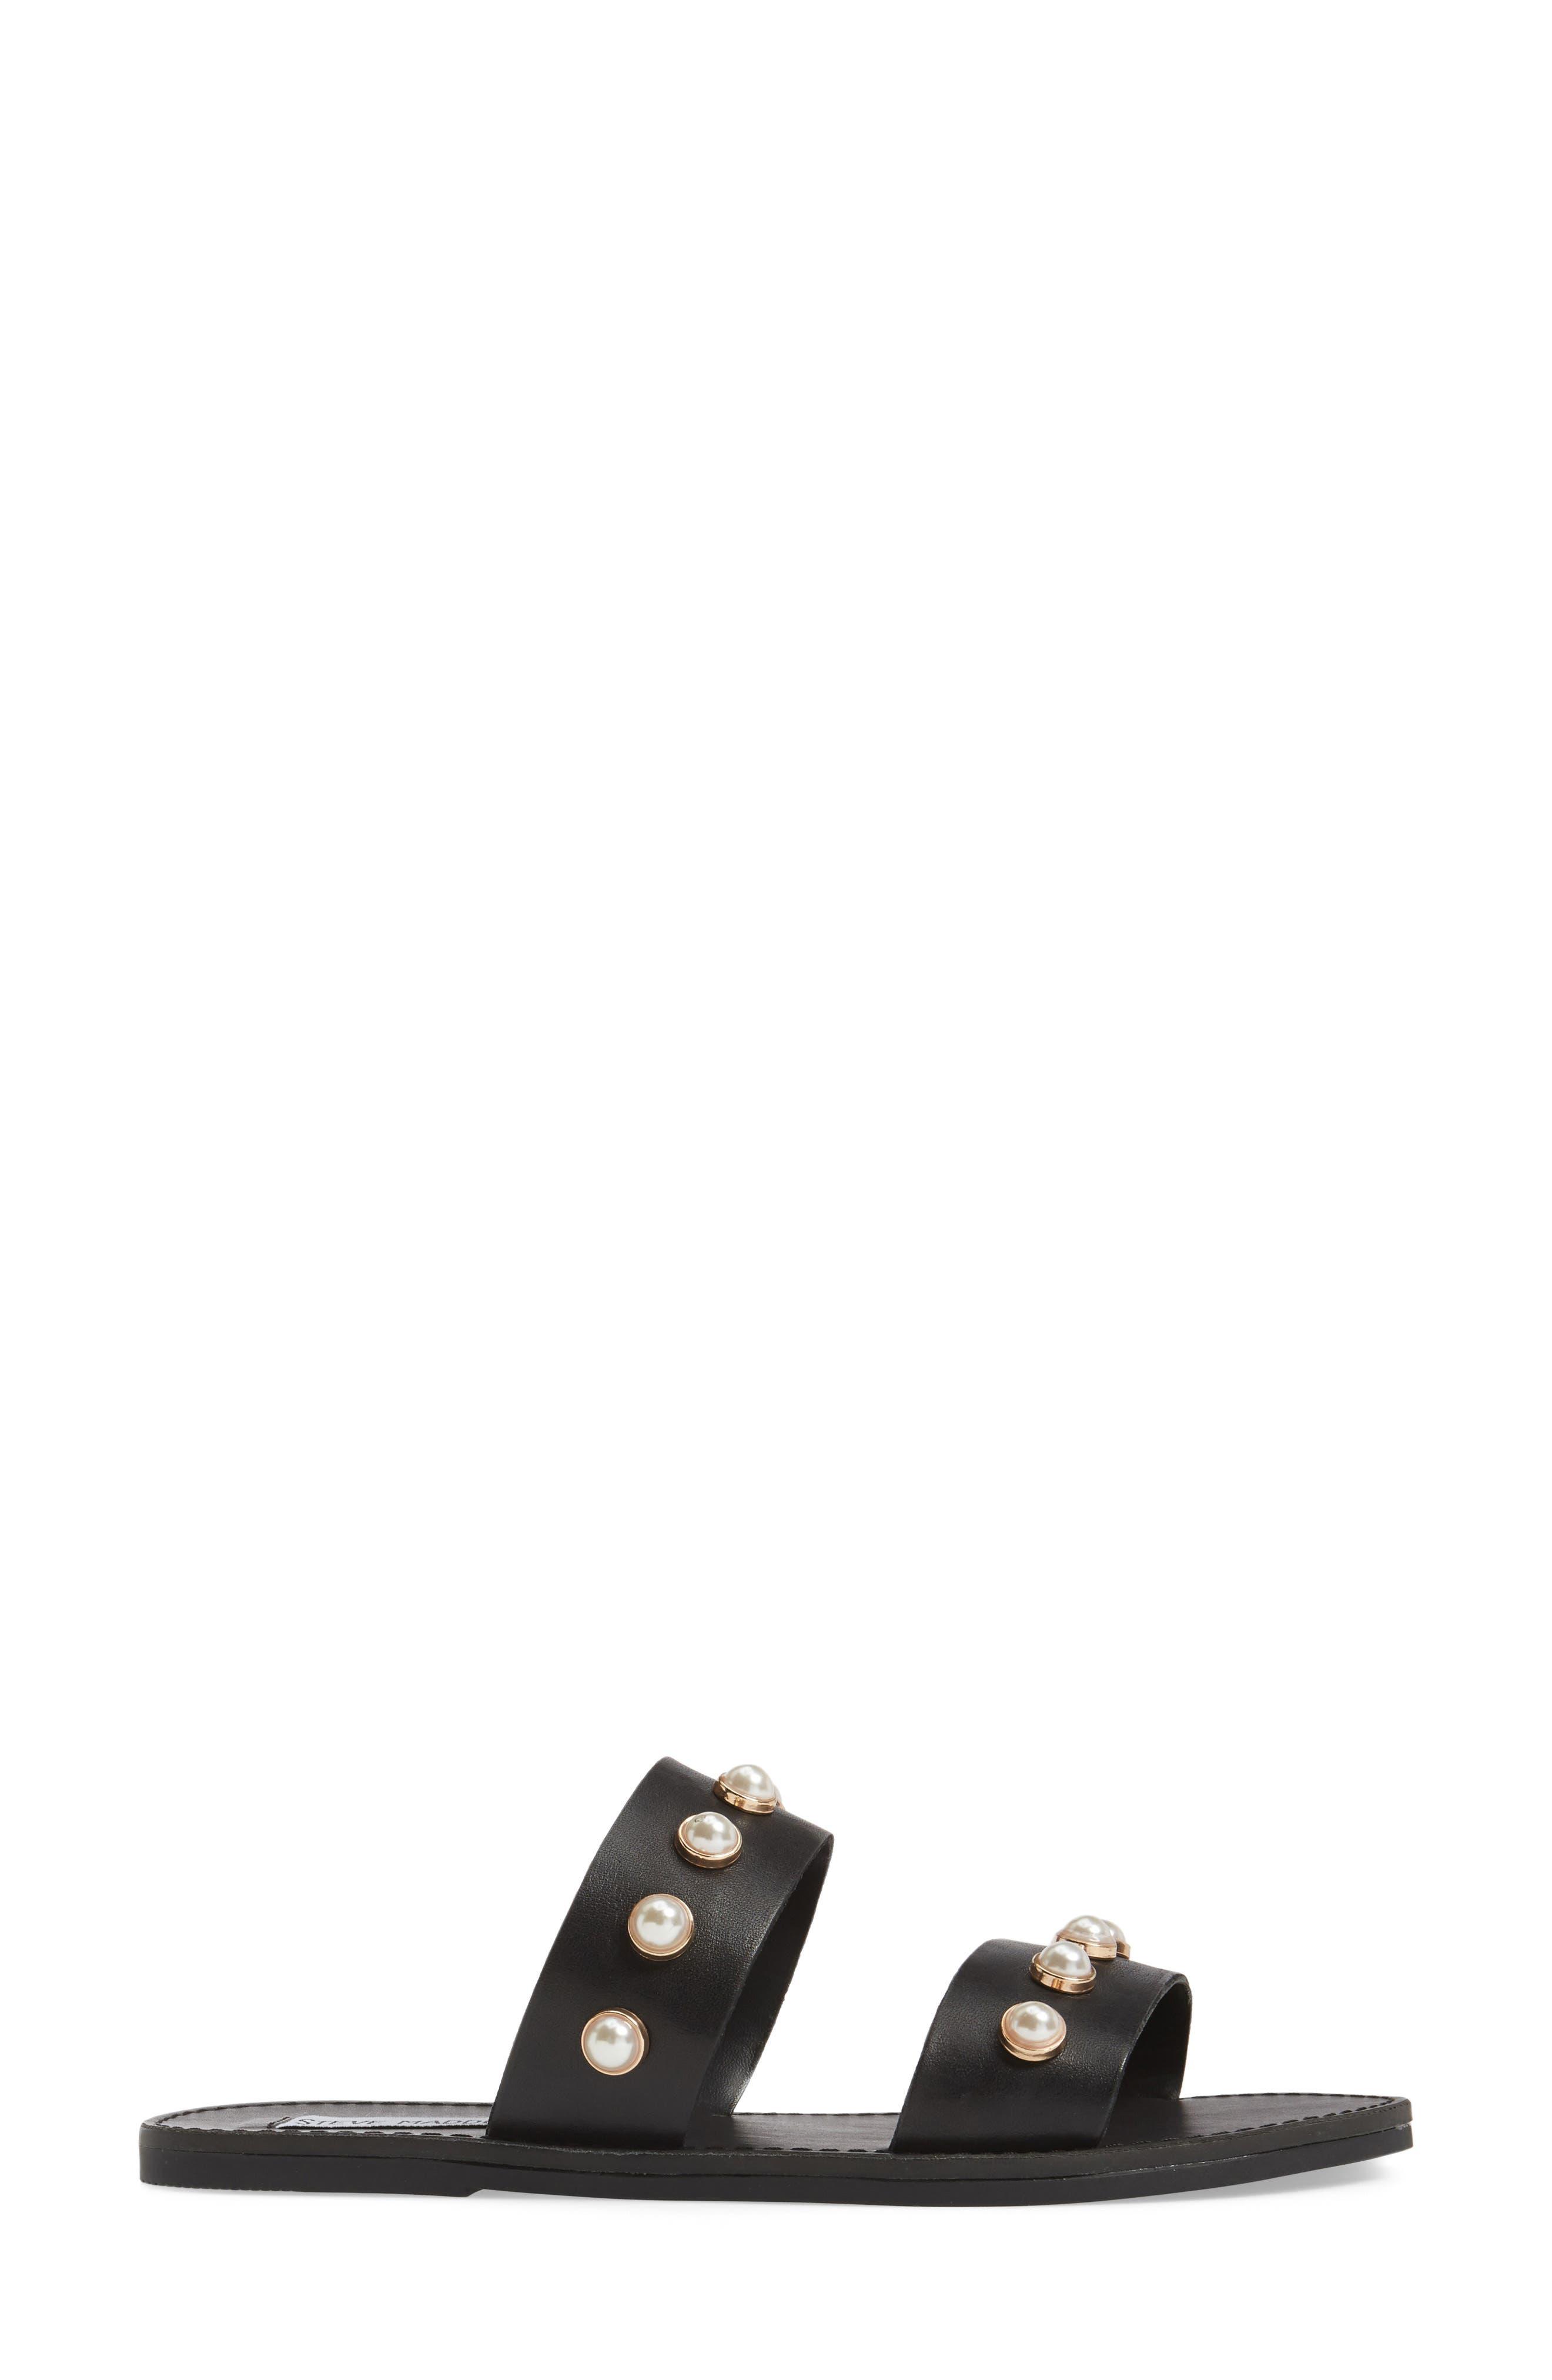 STEVE MADDEN, Jole Embellished Slide Sandal, Alternate thumbnail 3, color, 001